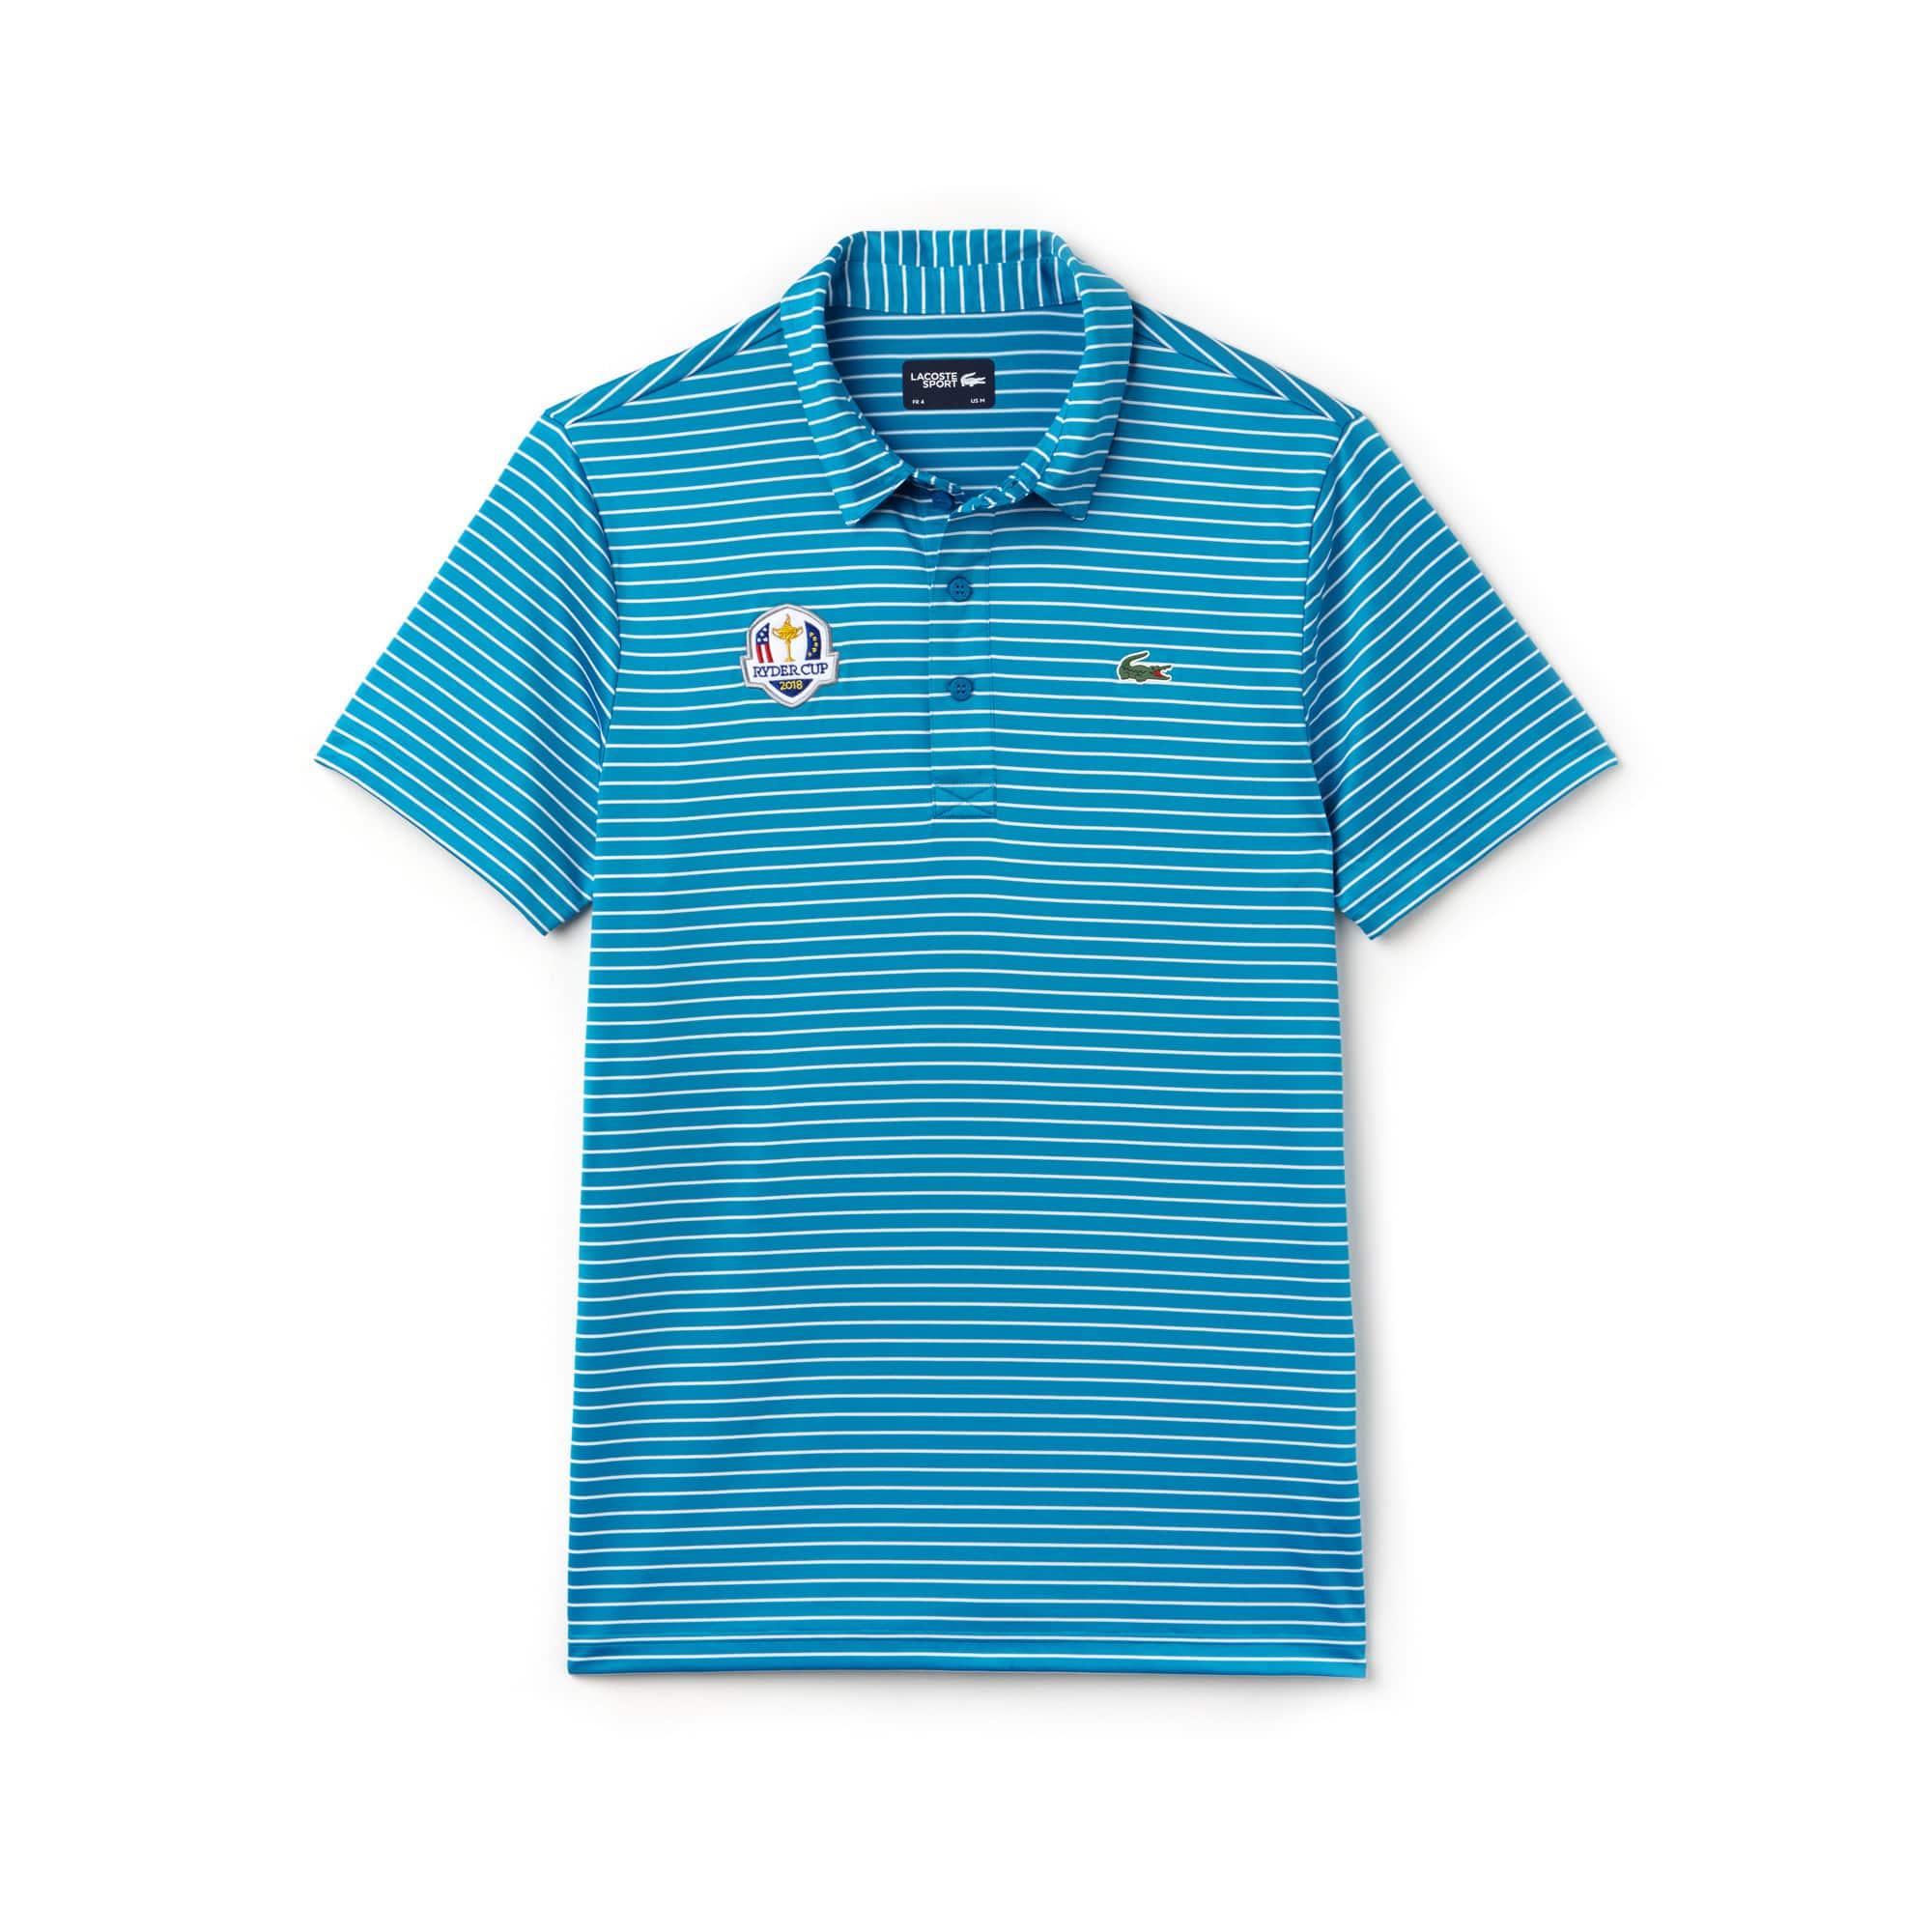 Herren LACOSTE SPORT Ryder Cup Edition gestreiftes Poloshirt